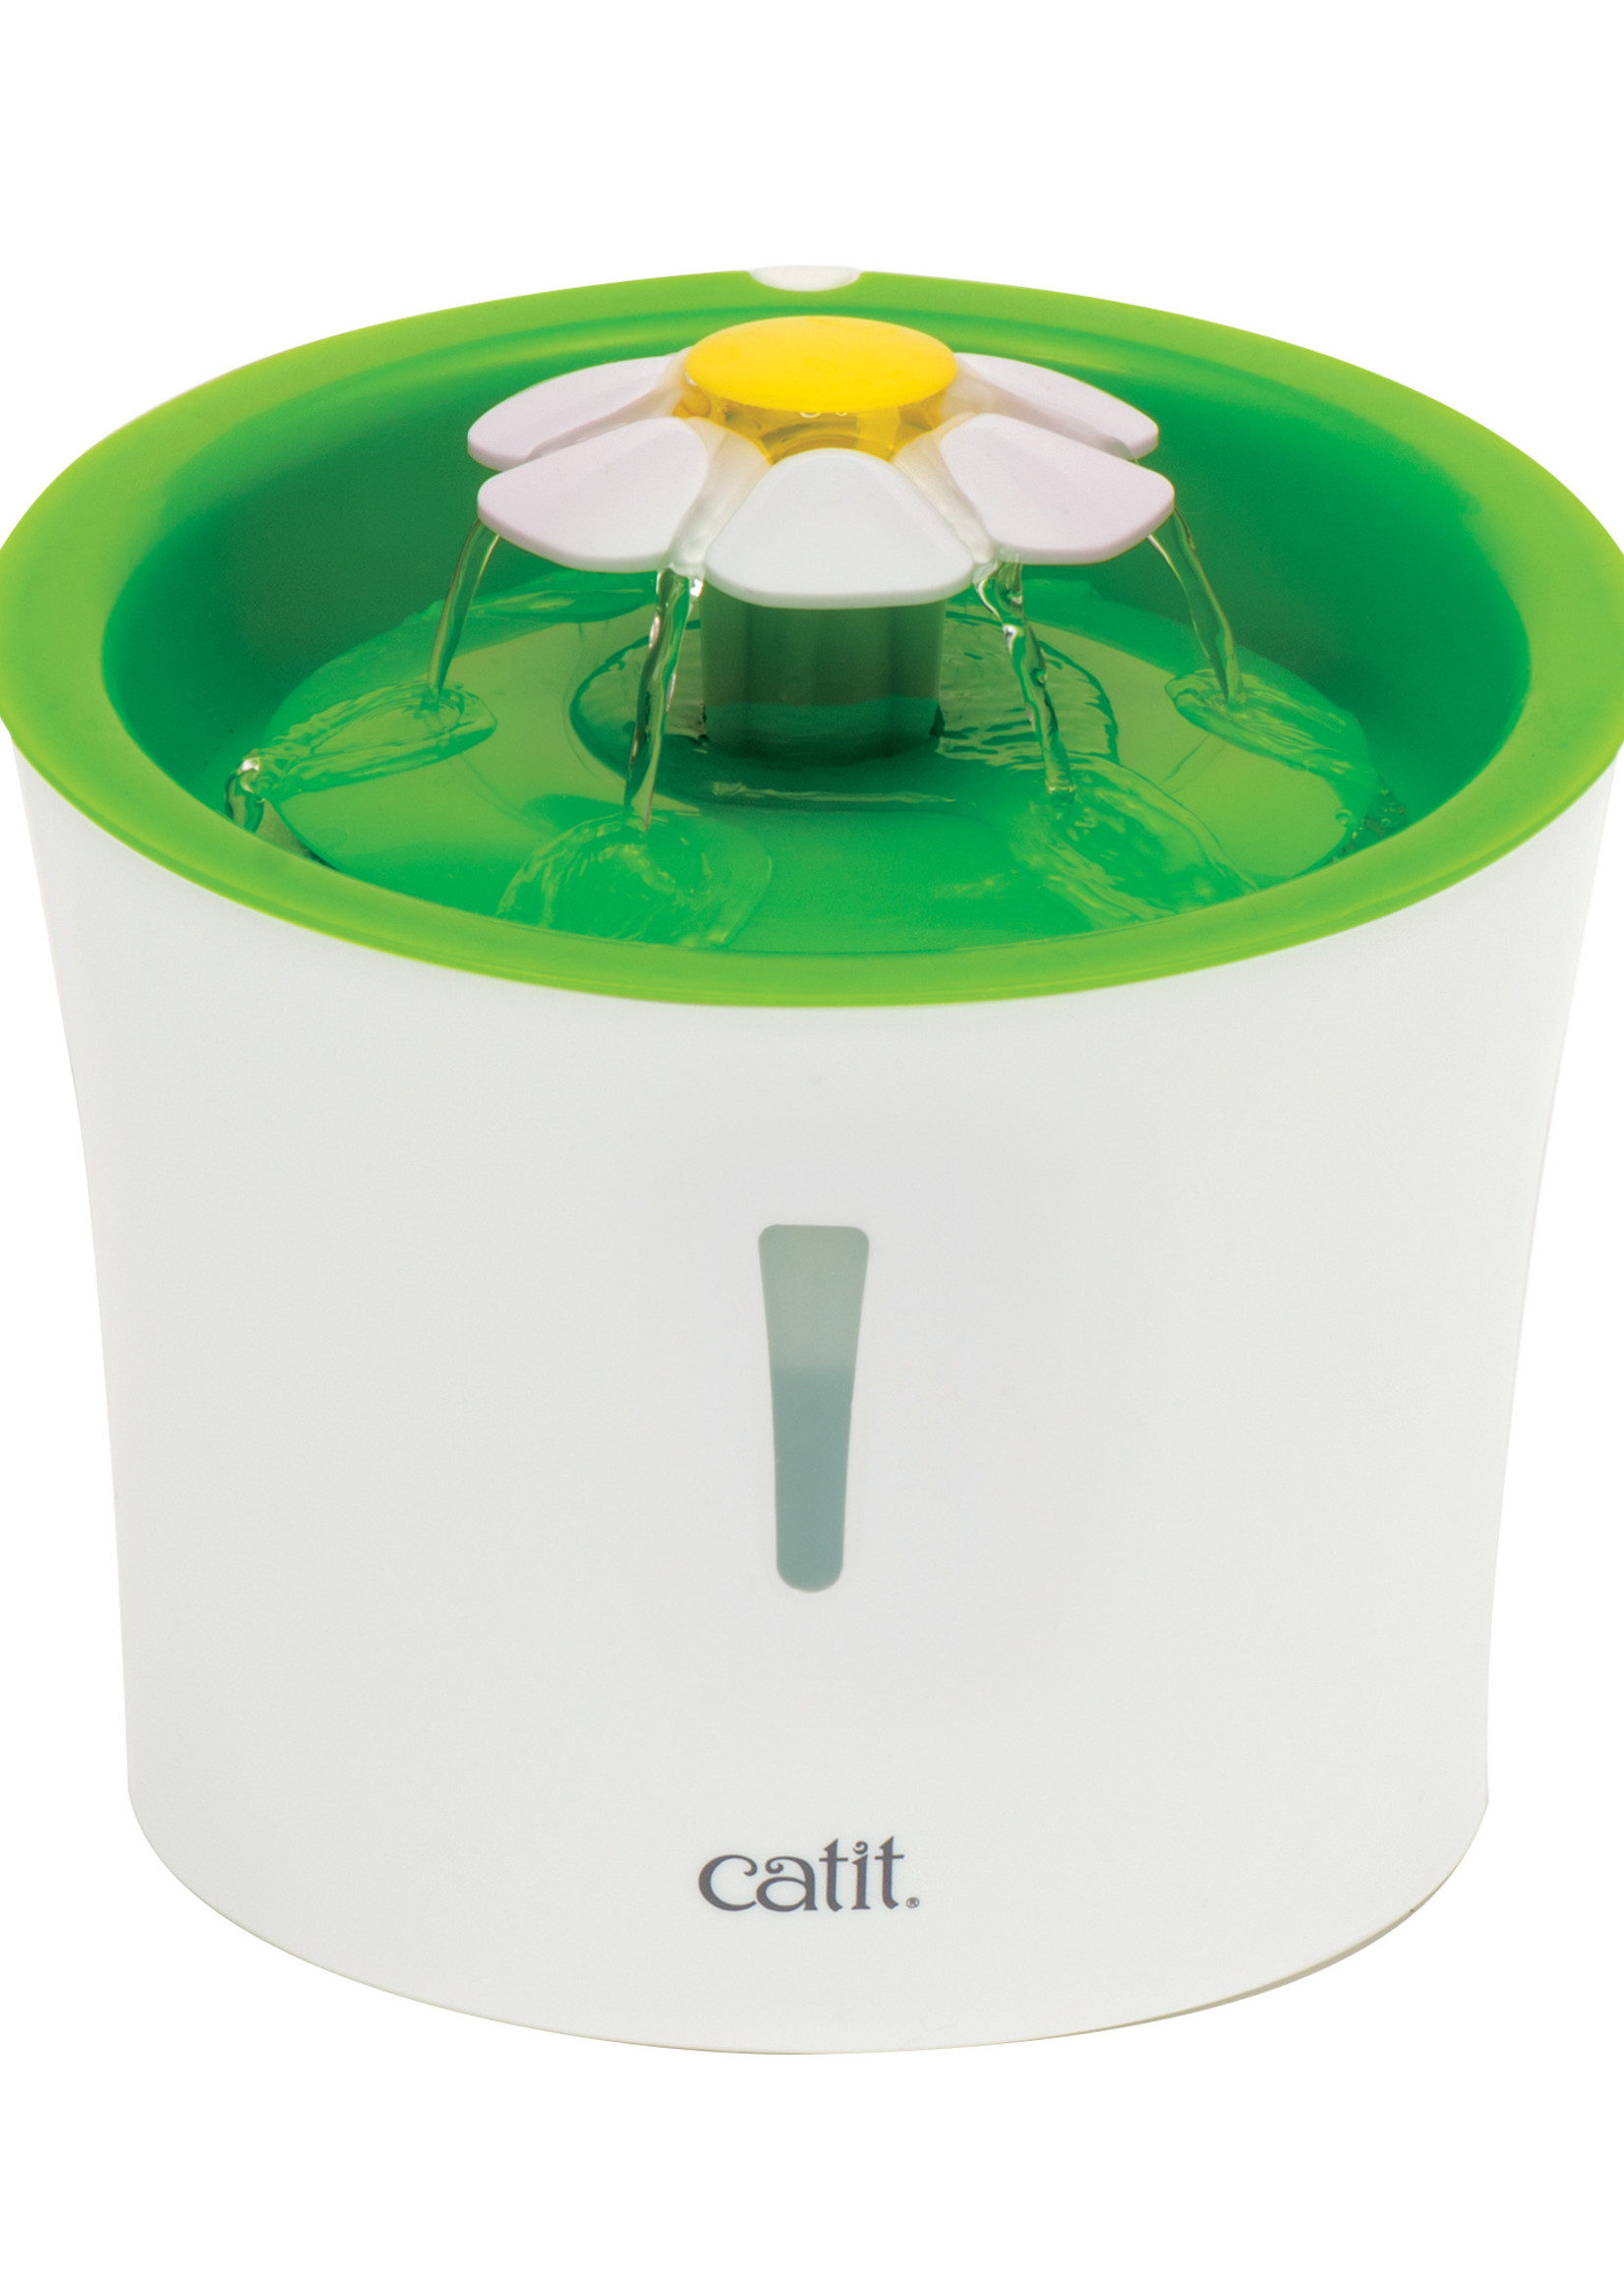 Catit® Catit 2.0 Flower Fountain